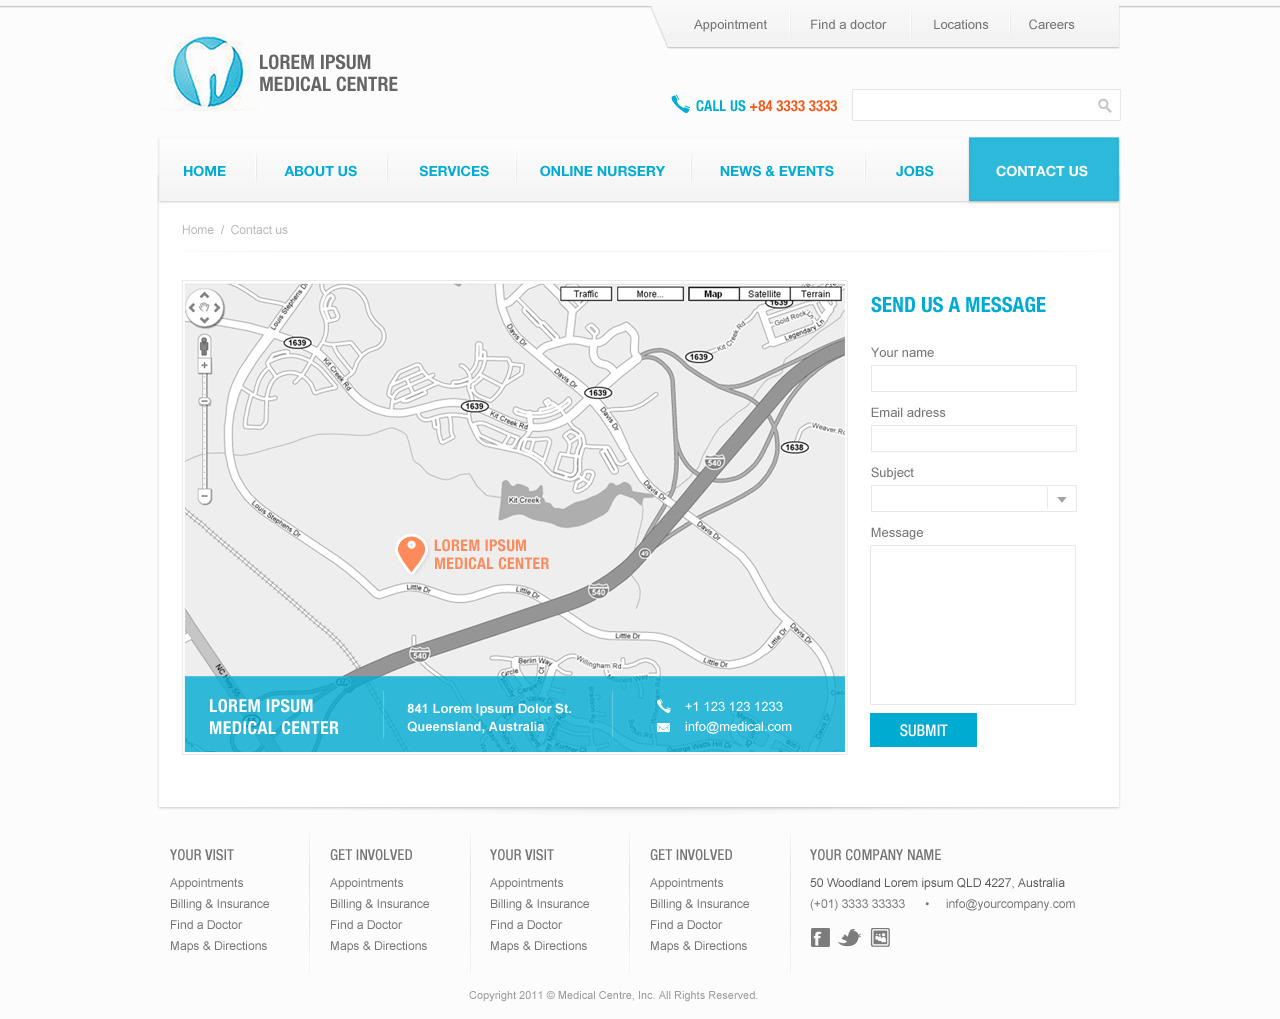 eBlue Medical Dentist Site Template